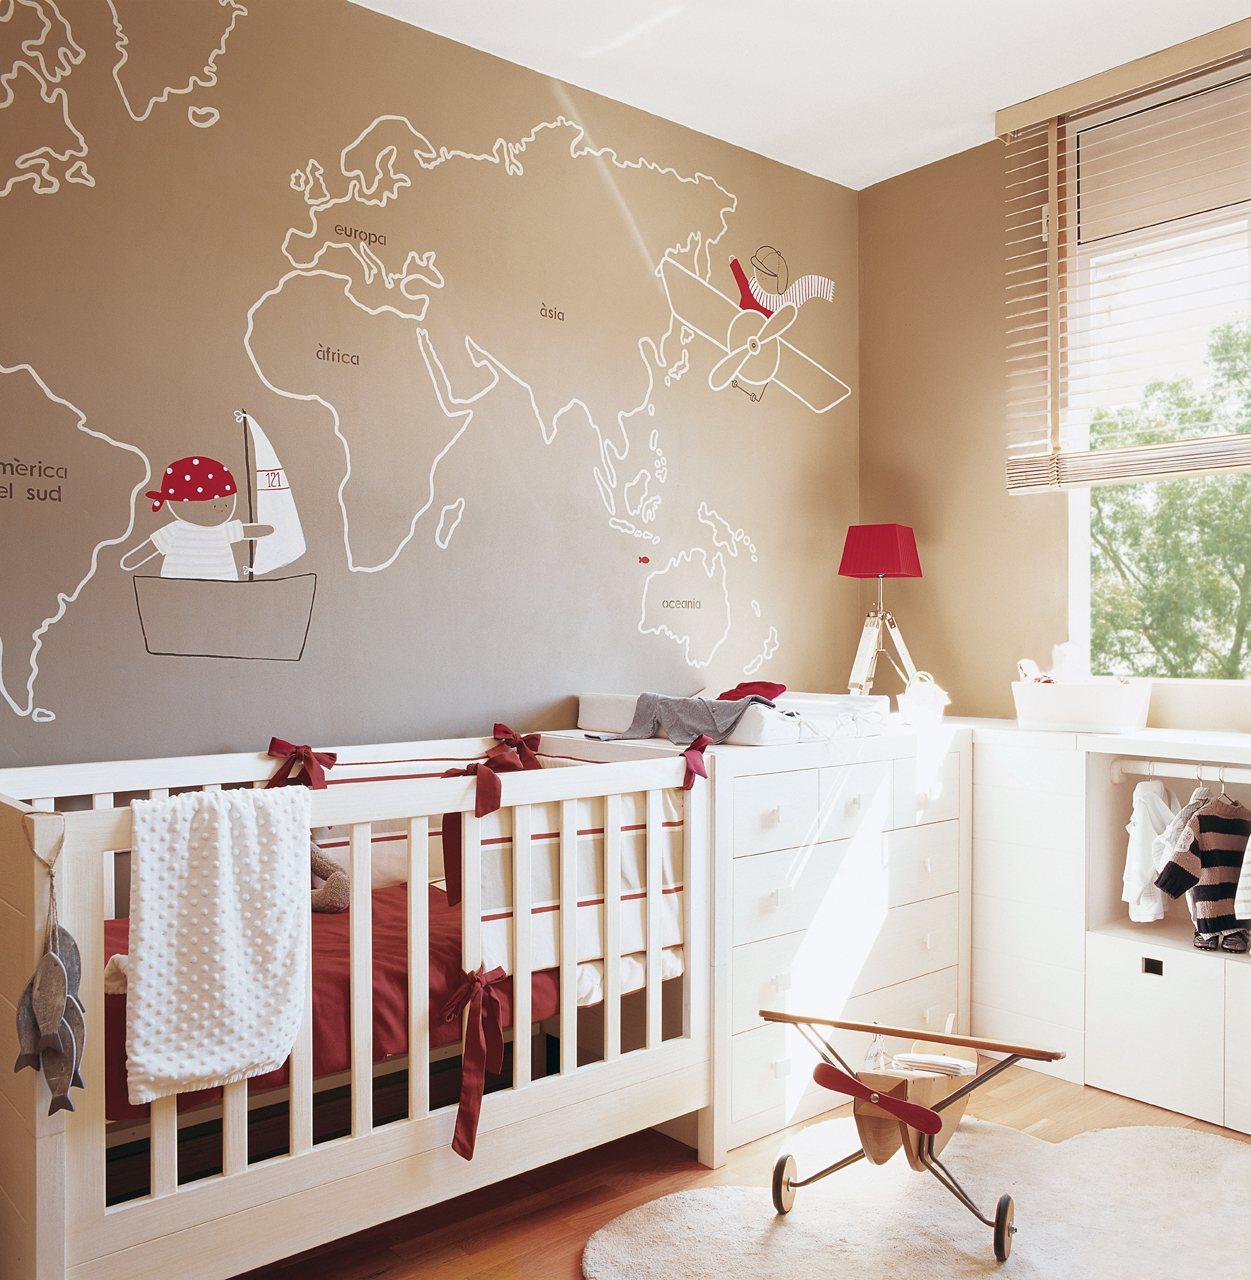 habitacin infantil con mapamundi pintado su primera habitacin